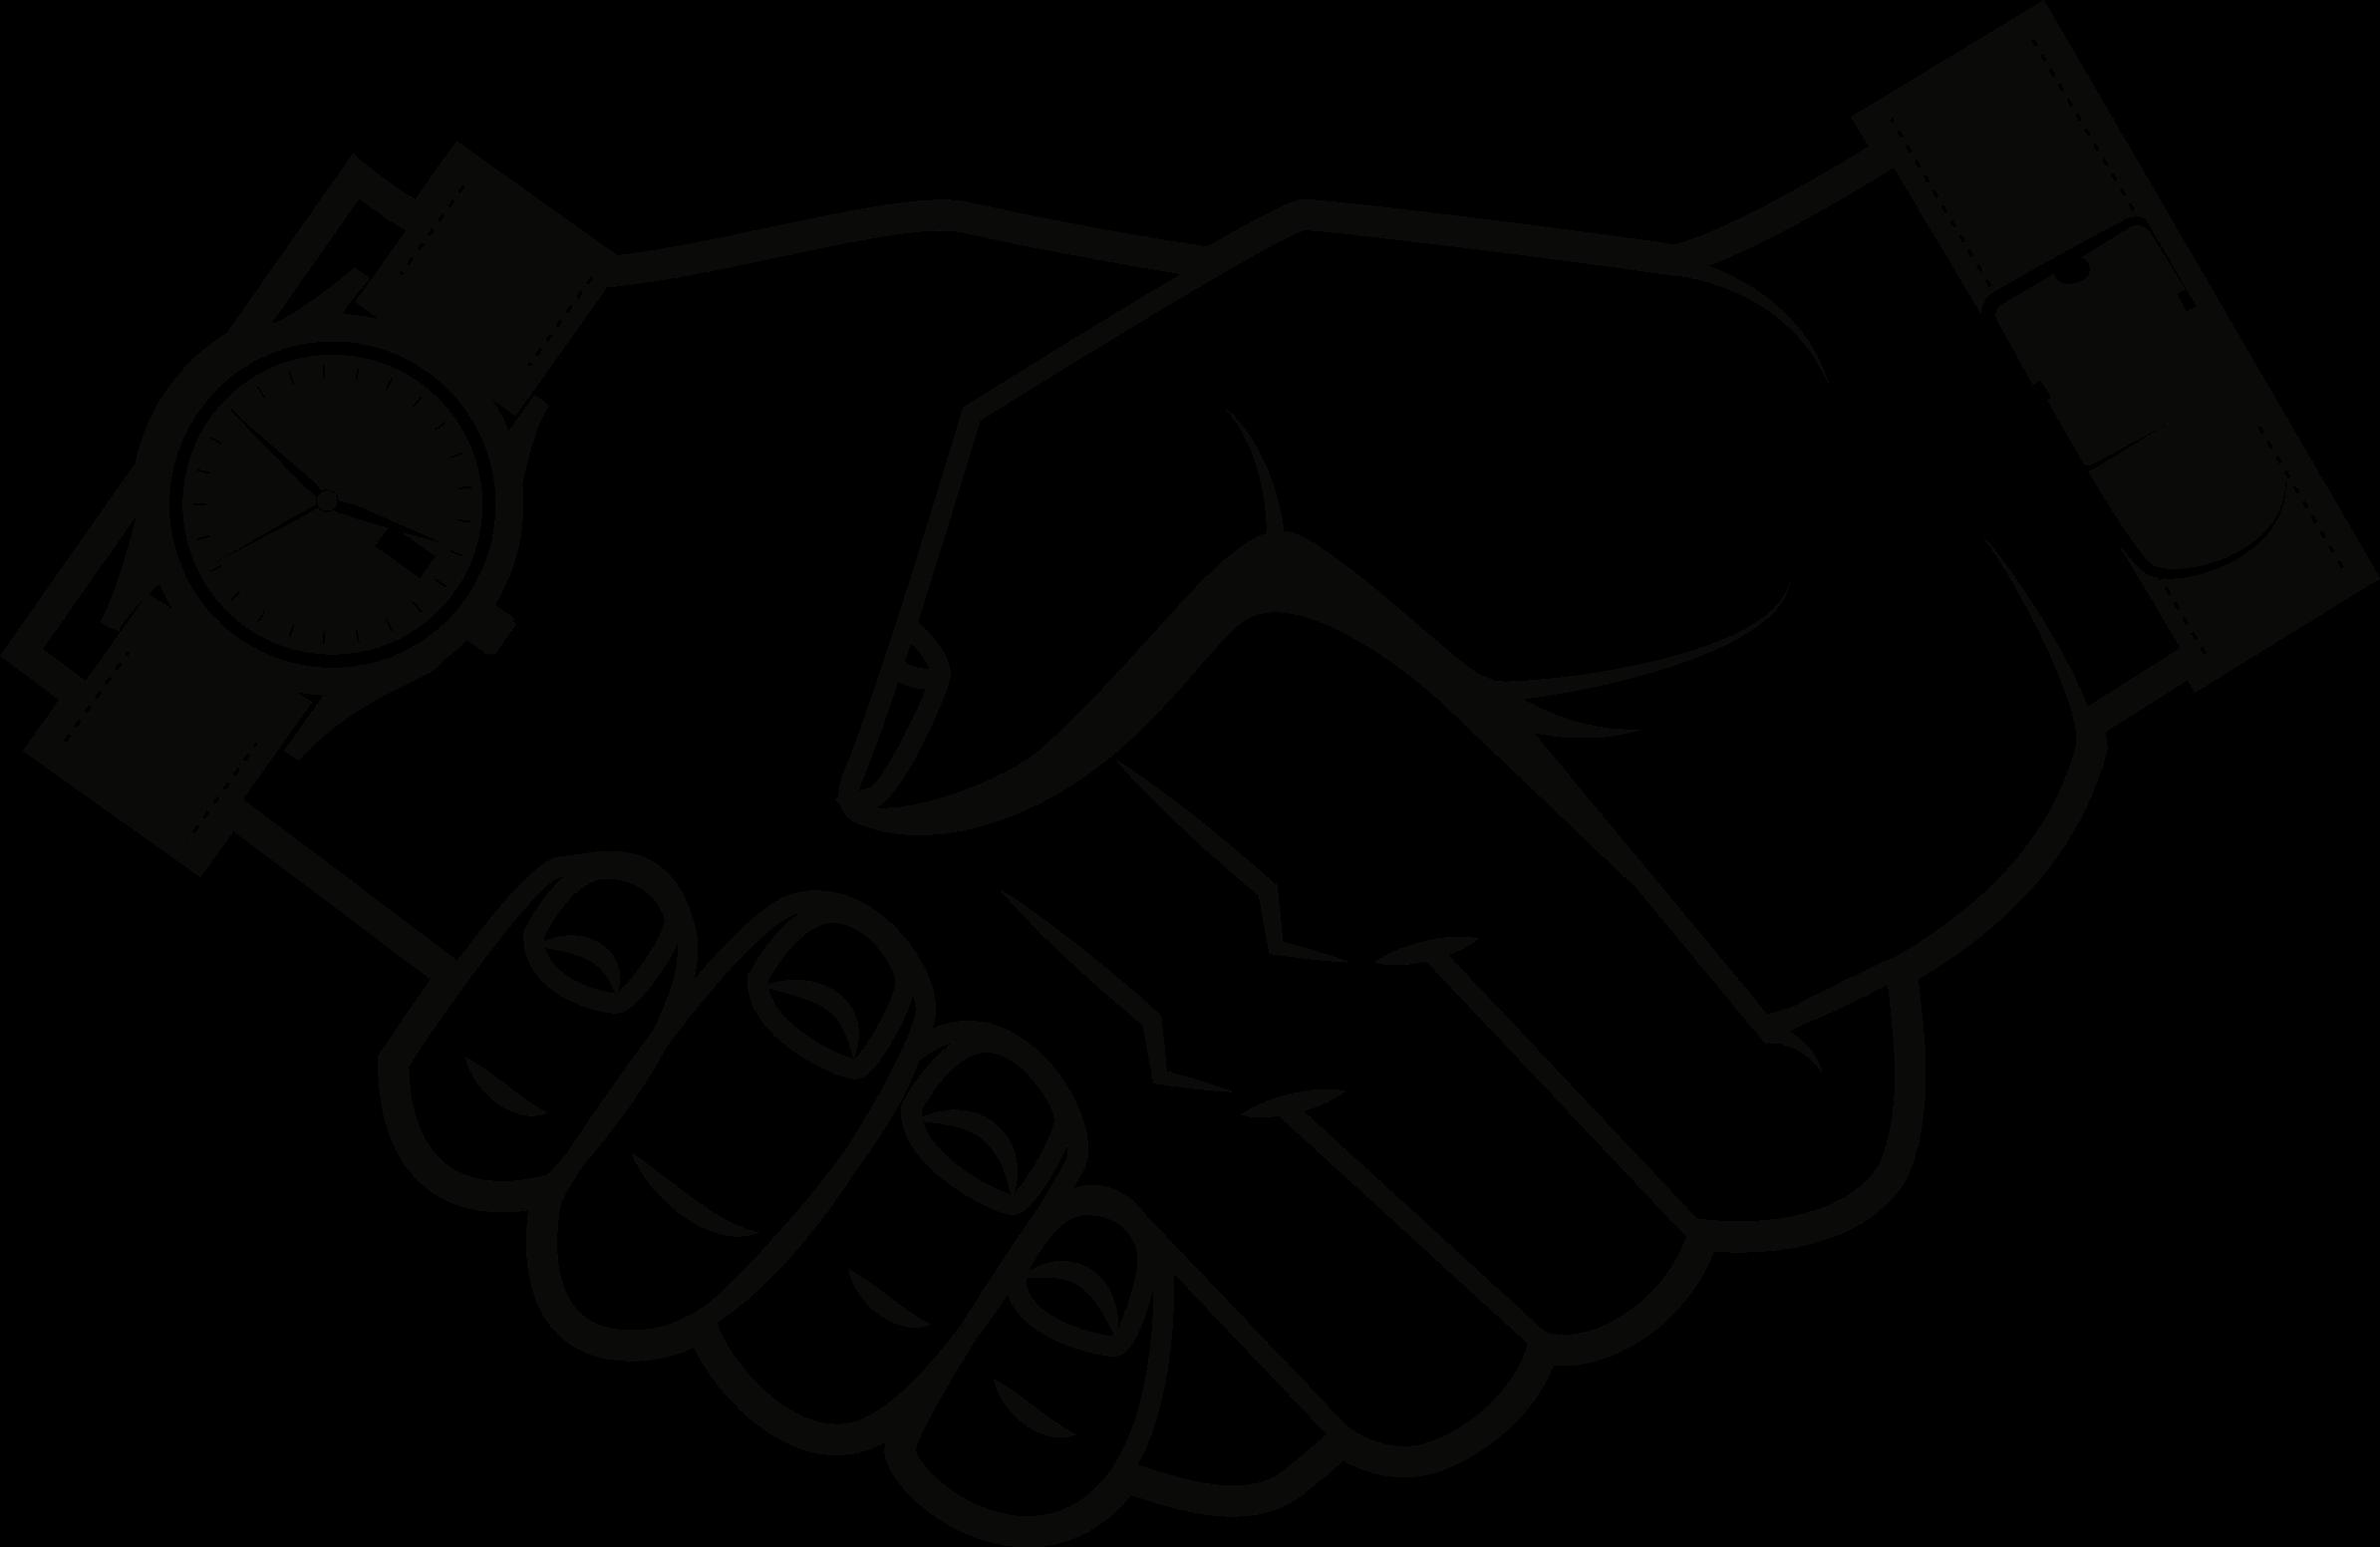 Handshake clipart drawn. Big image png